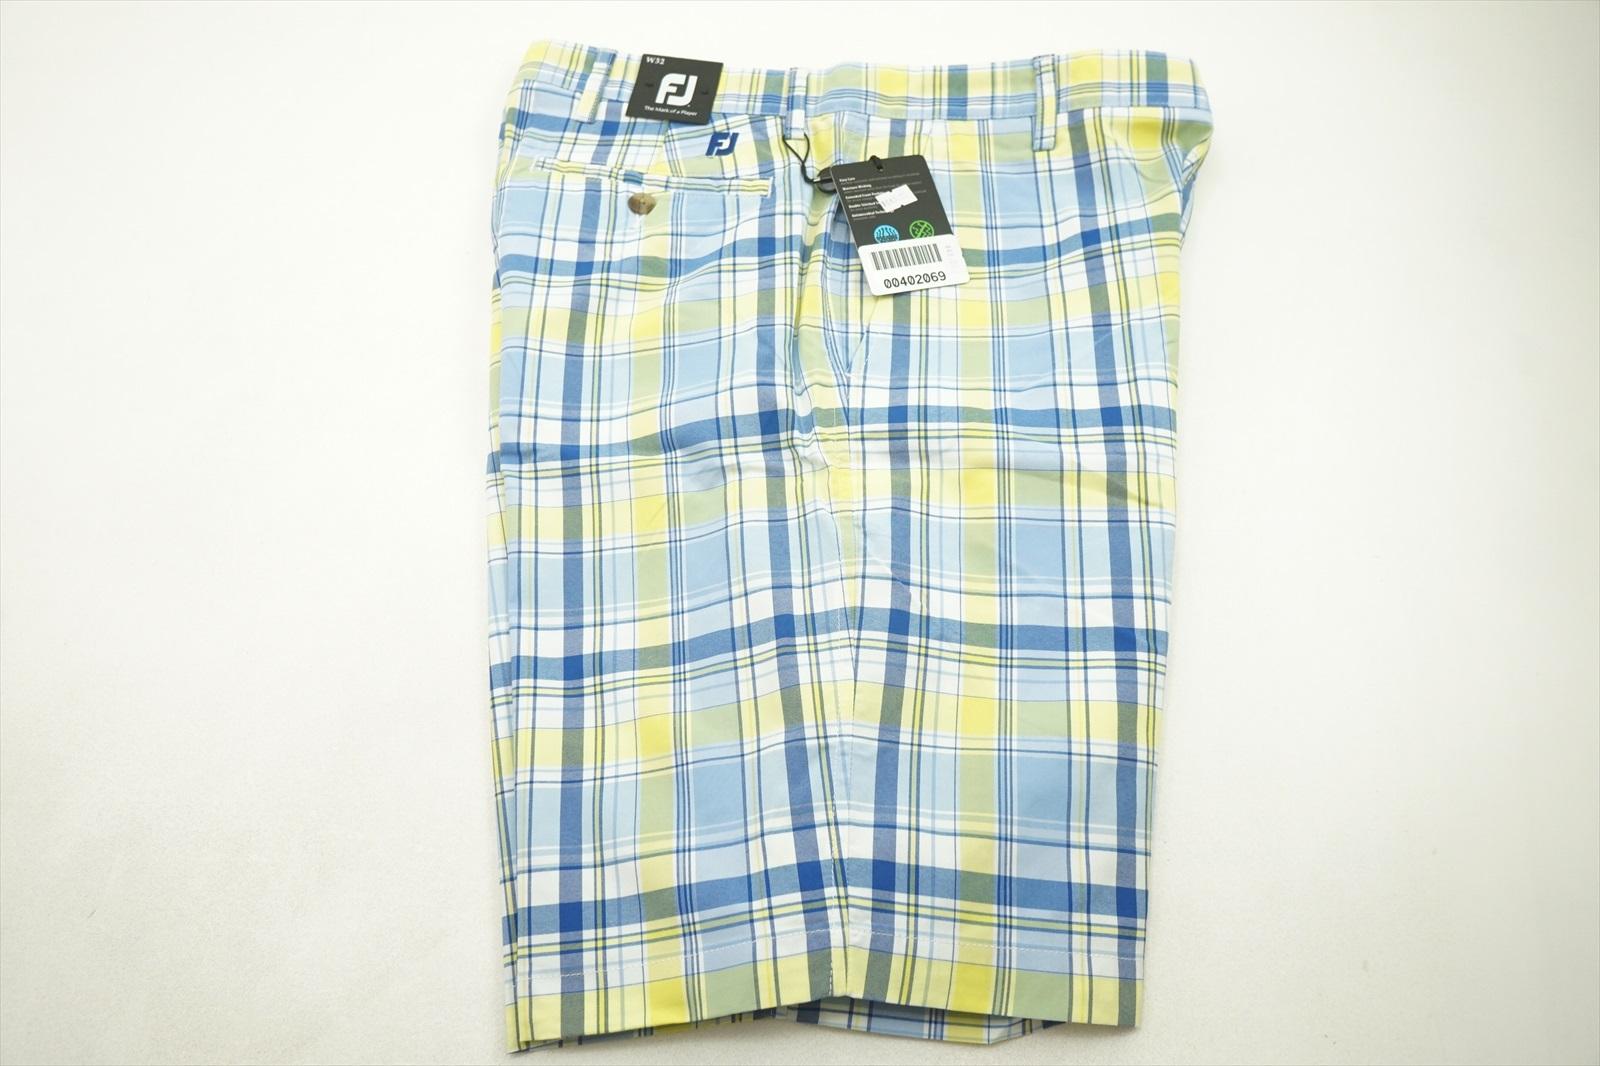 291d3950b0032 New FootJoy Golf Madras Plaid Shorts Mens Size 32 White/Blue/Yellow ...